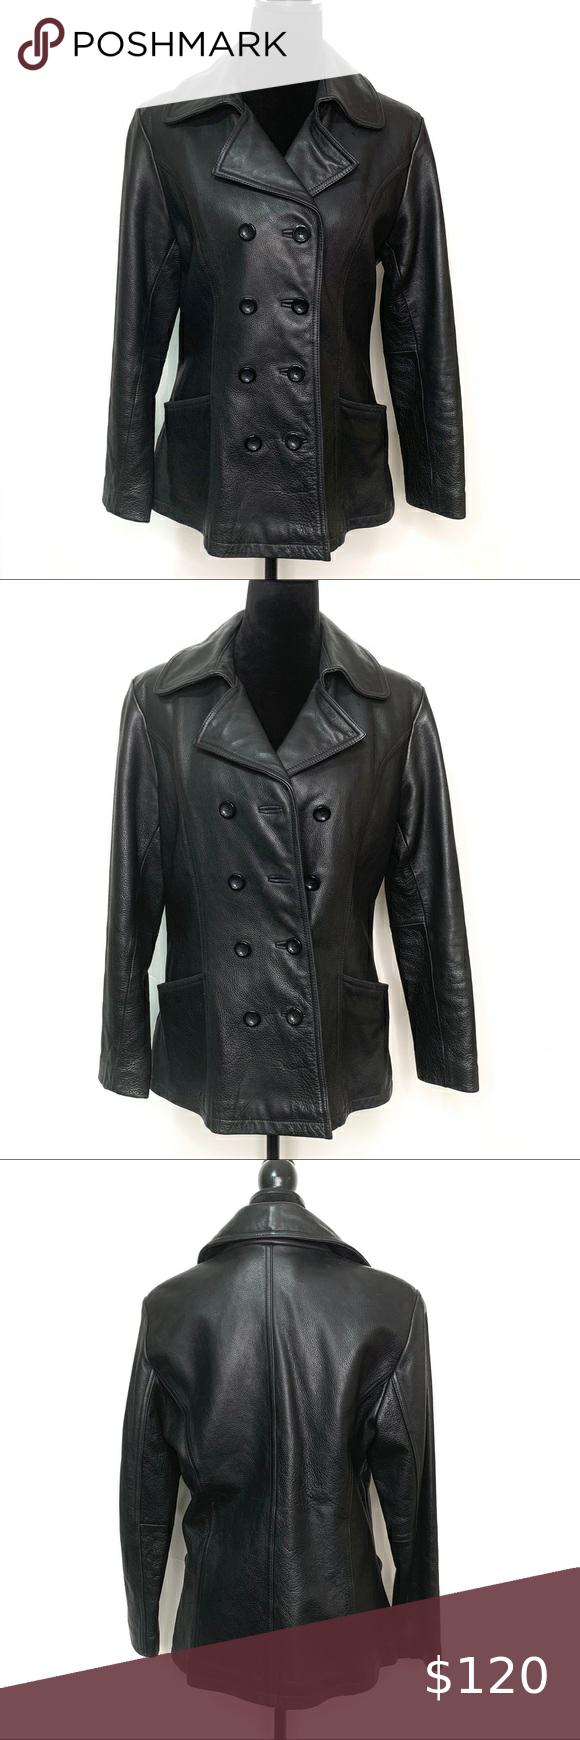 Vintage Jny Jones New York Leather Jacket Leather Jacket Jones New York Vintage Leather Jacket